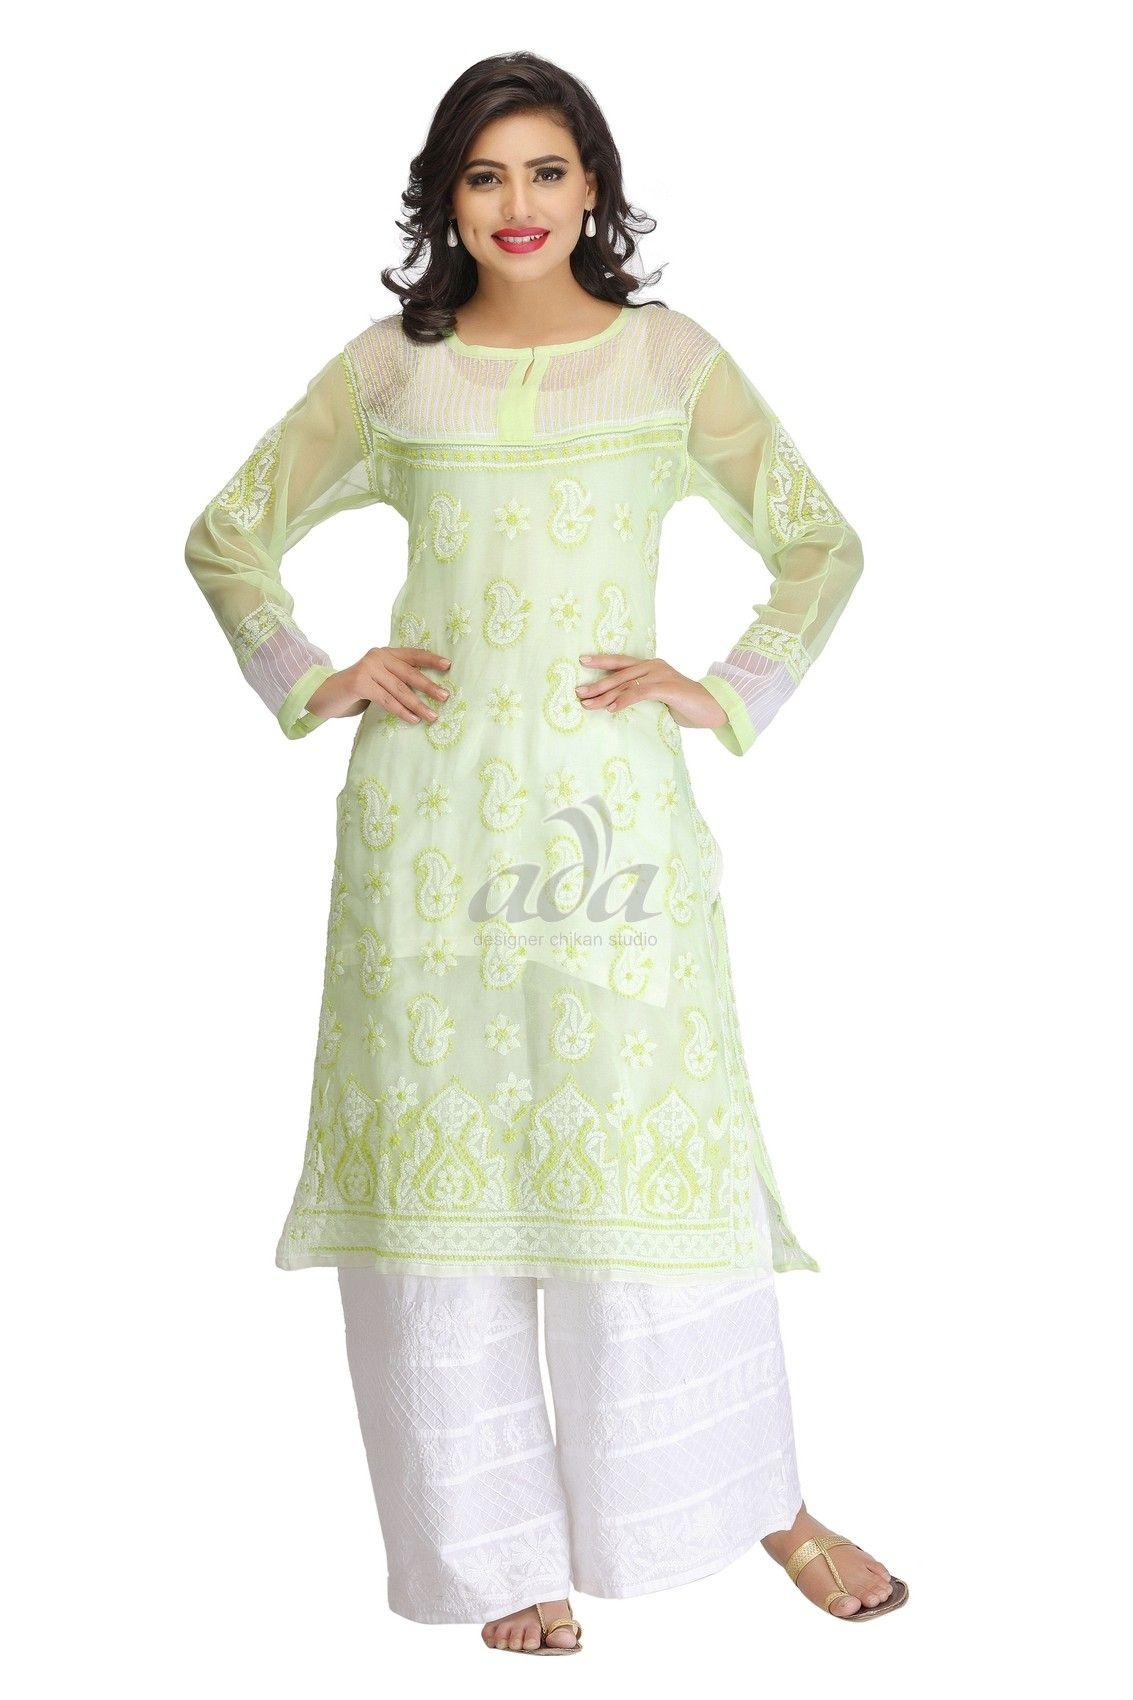 181e753737 Ada Hand Embroidered Green Faux Georgette Lucknowi Chikankari Kurti -  A132981 Price Rs.1,850.00 #Ada_Chikan #chicken kurta online #lucknowi kurta  online ...